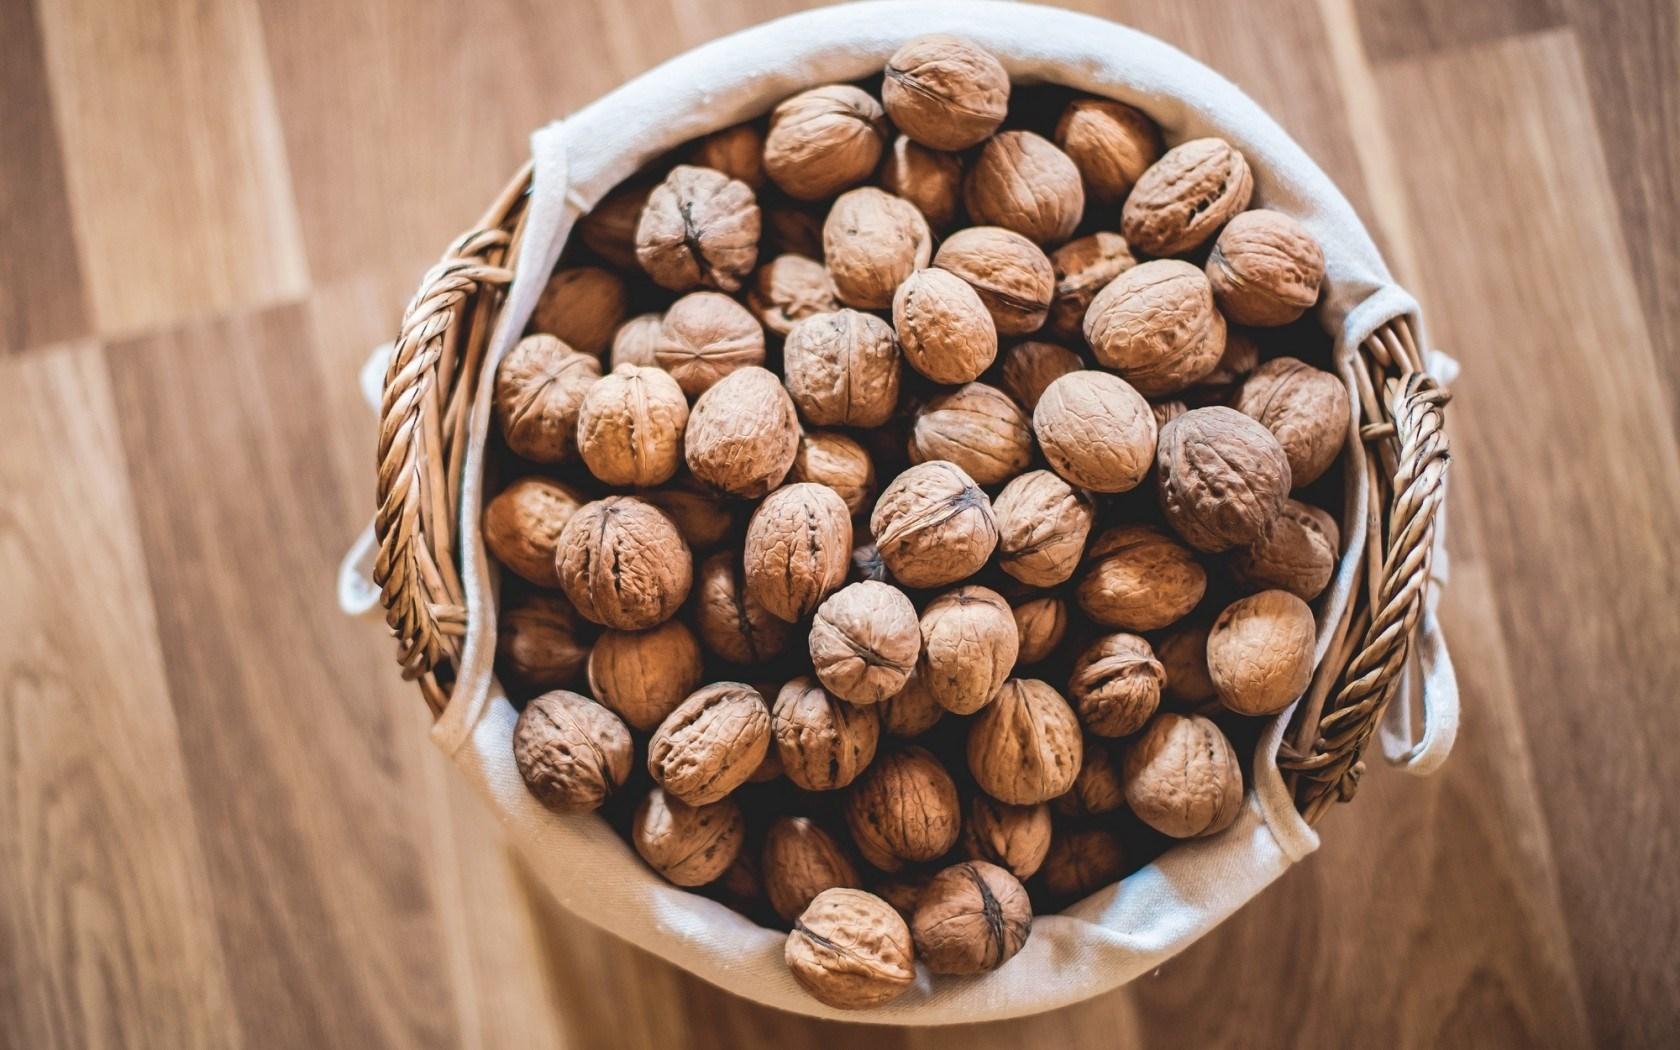 Walnuts Basket